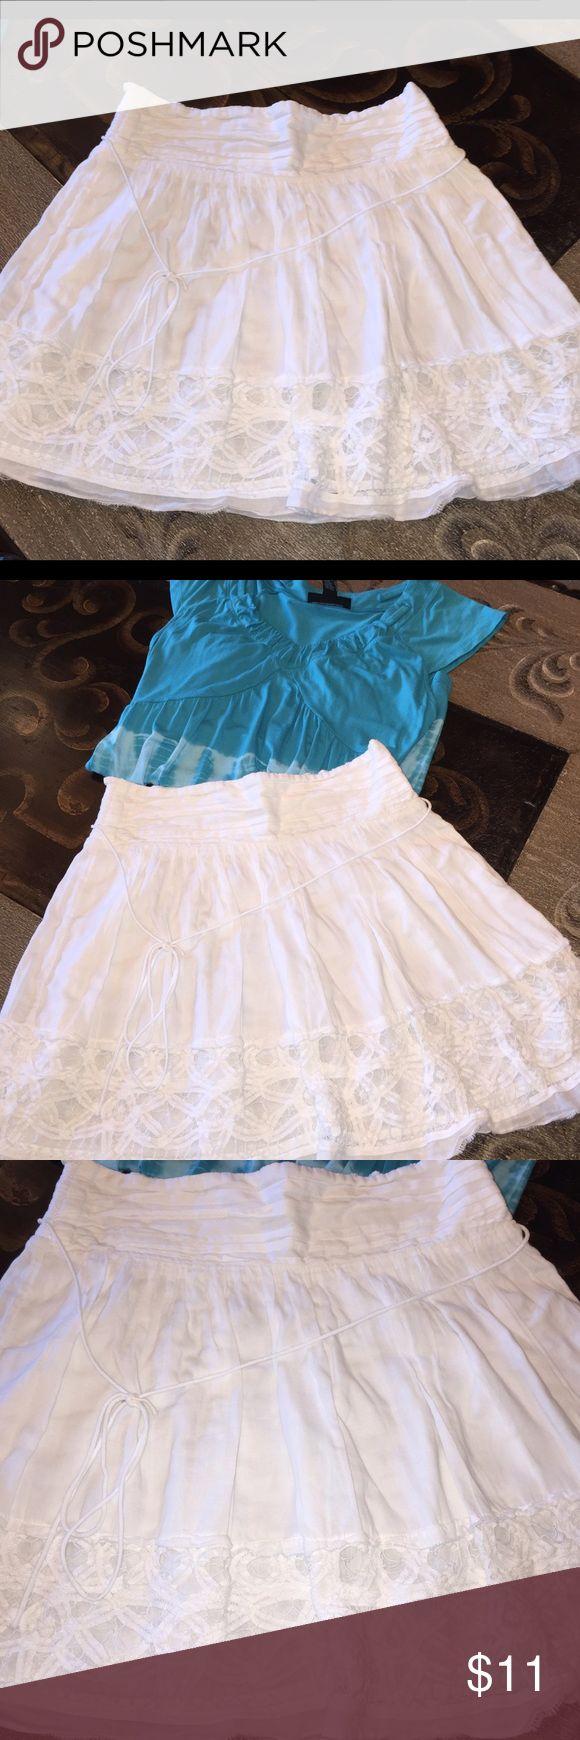 ✂️LAST CALL✂️American Eagle White Lace W/Lace Mini Beautiful Ladies white w/lace American Eagle Outfitters skirt, size Med American Eagle Outfitters Skirts Mini